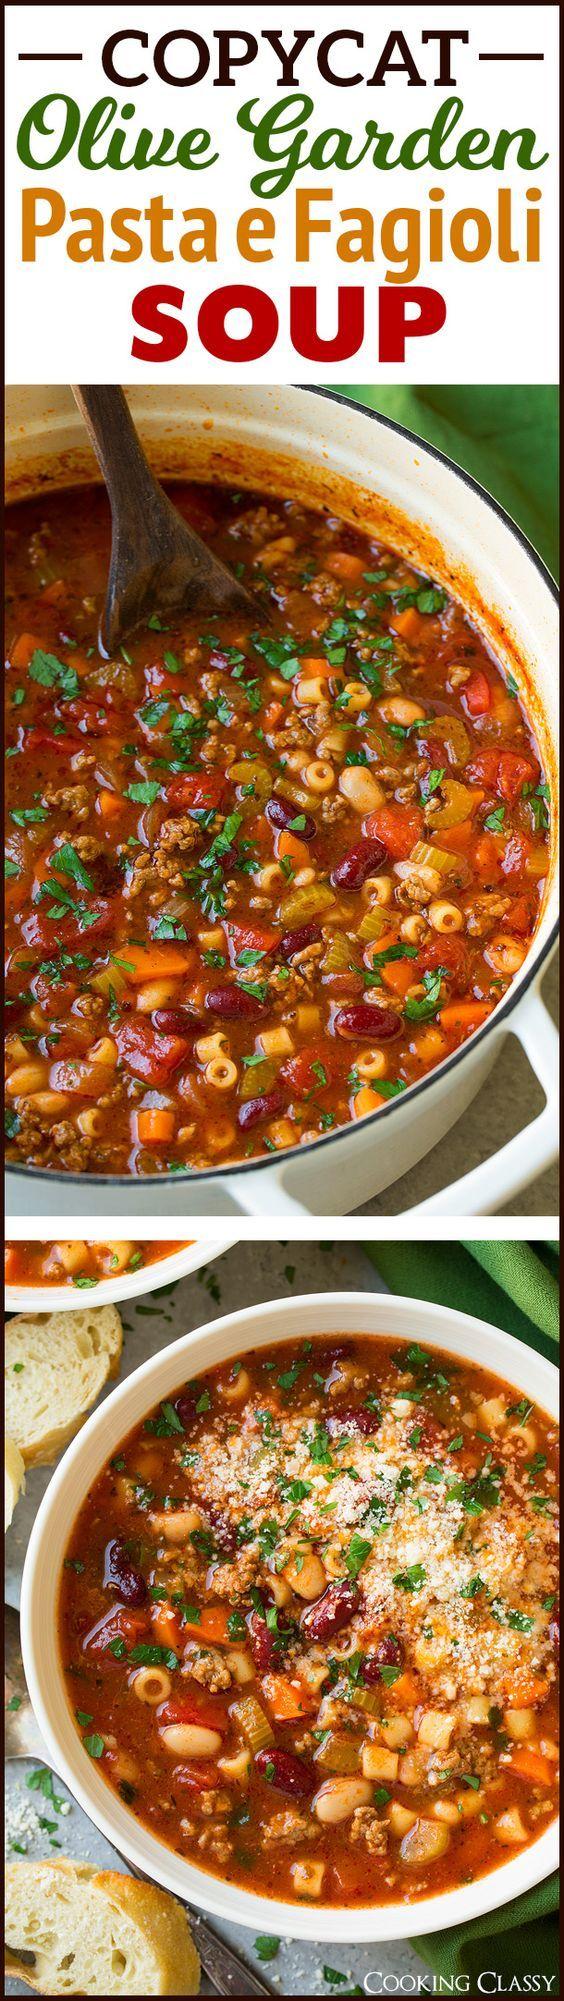 Olive Garden Pasta e Fagioli | Recipe | Olive garden pasta, Olive ...